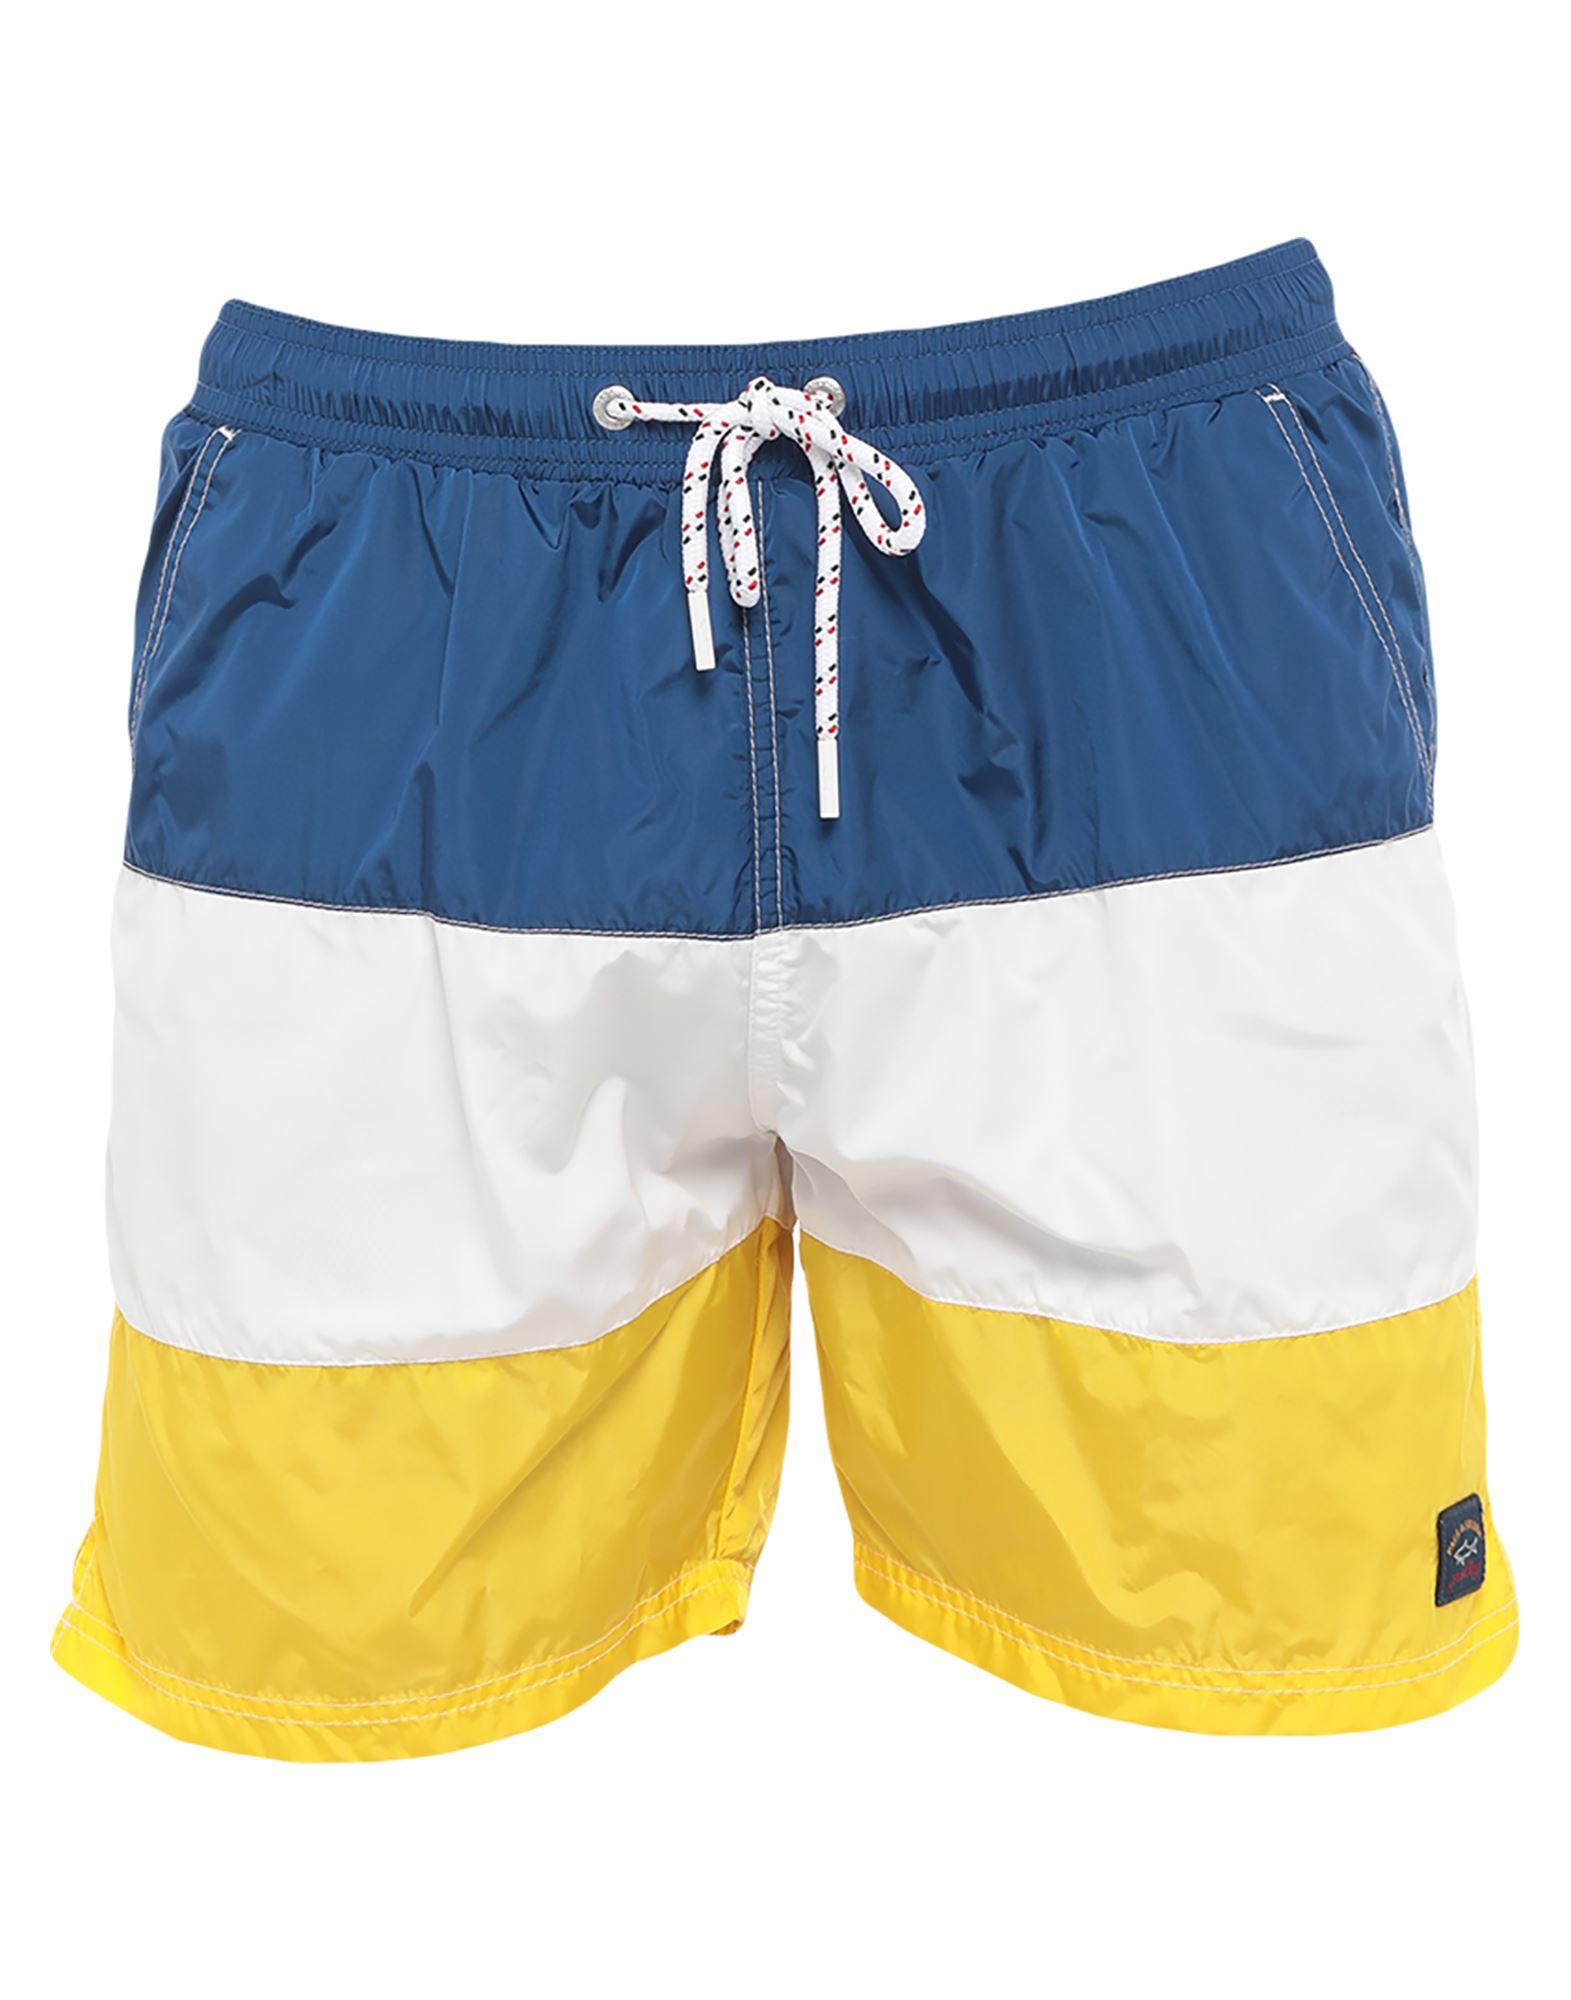 PAUL & SHARK Swim trunks - Item 47276906